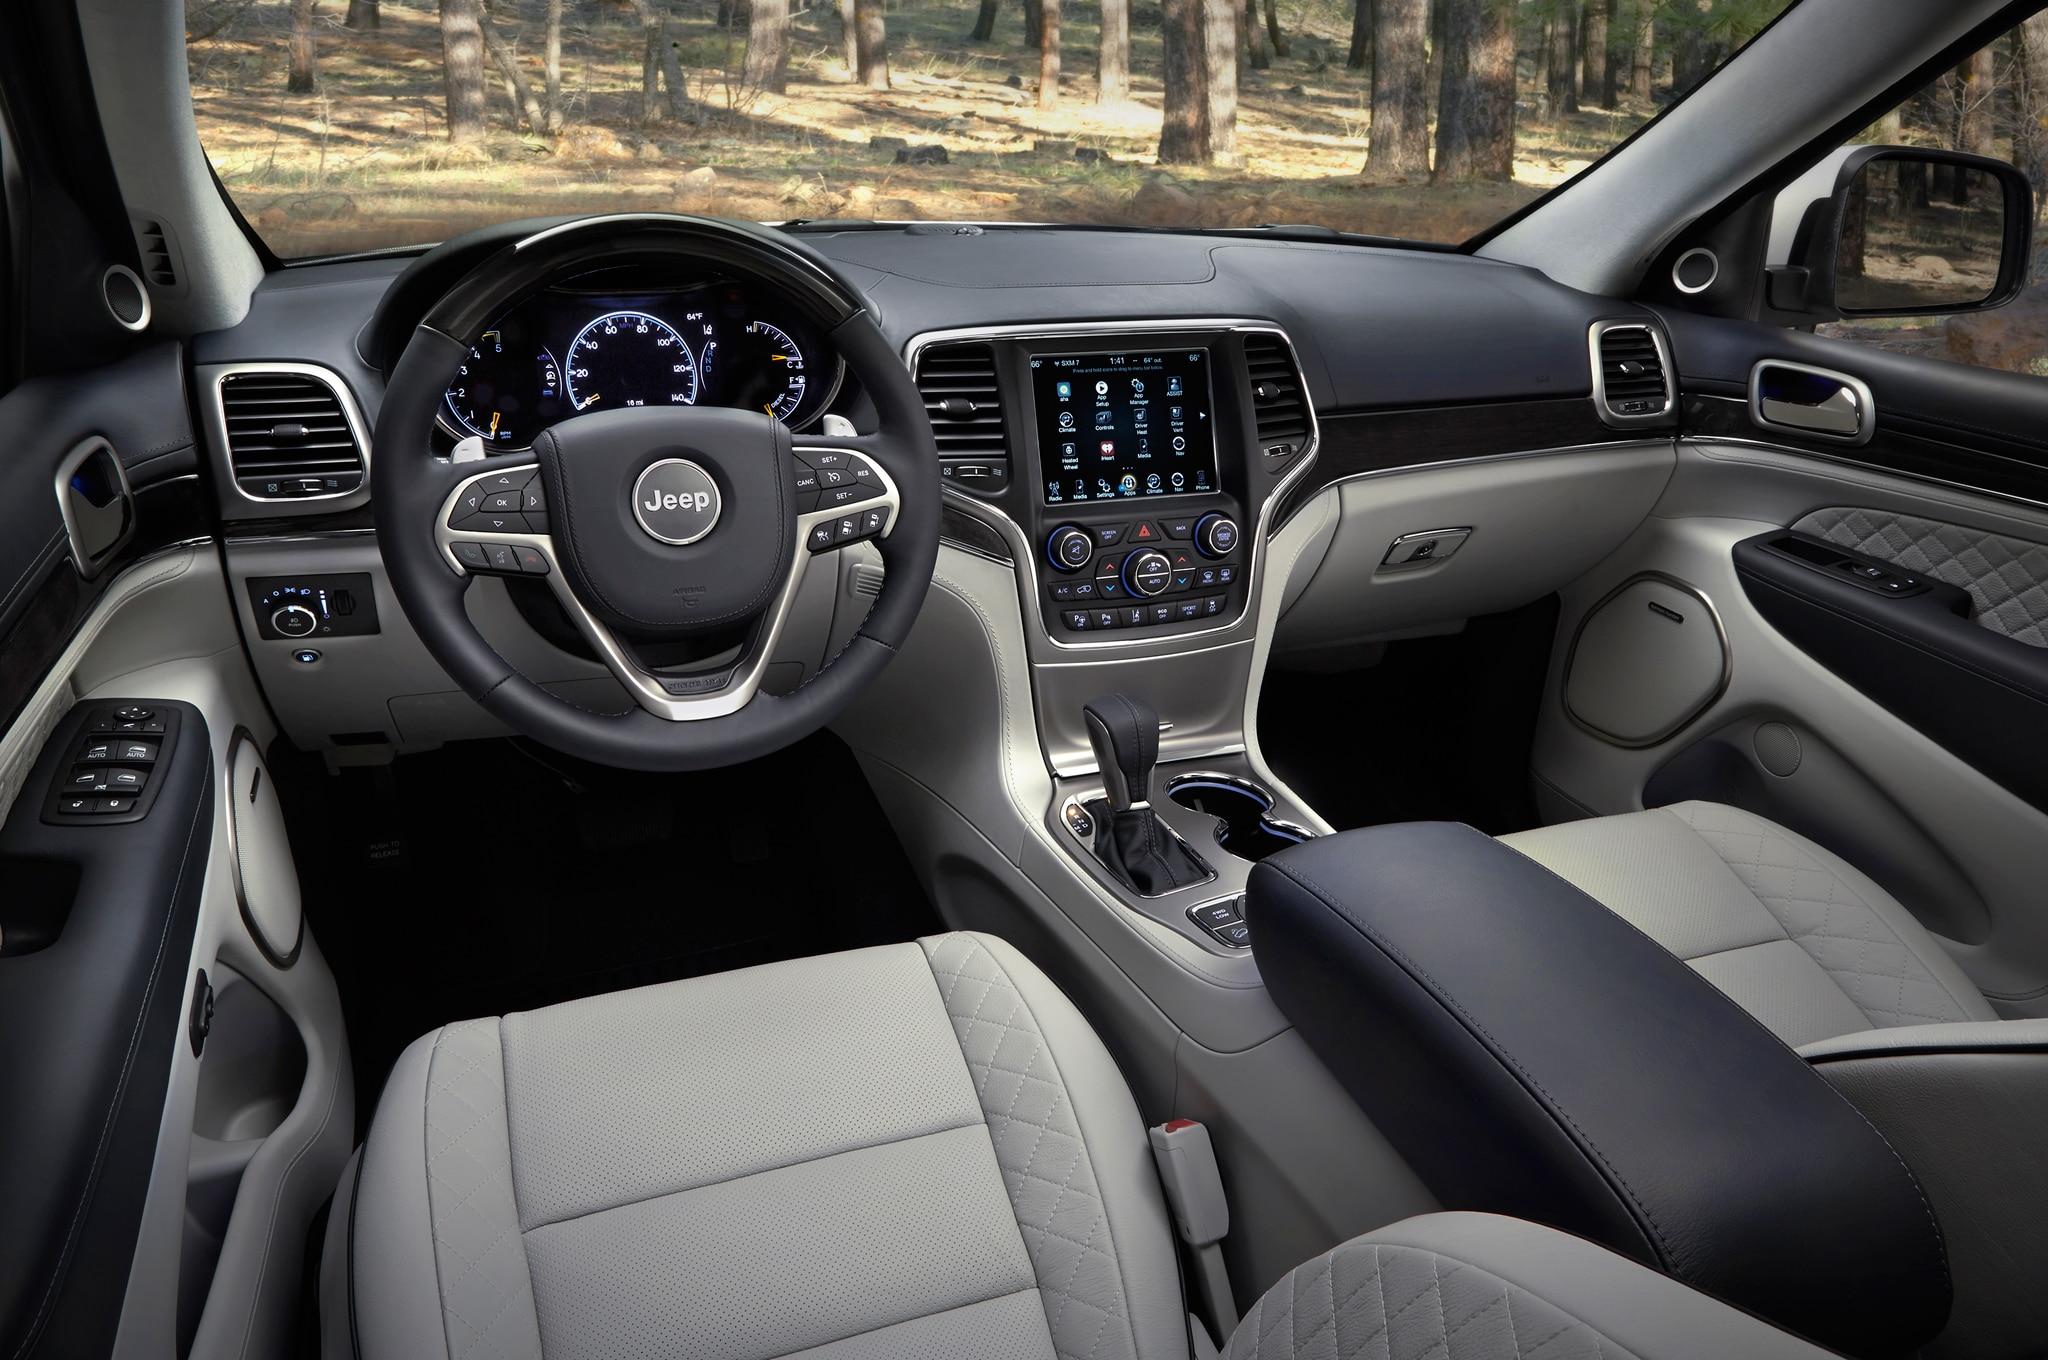 2017 jeep grand cherokee adds trailhawk updates summit